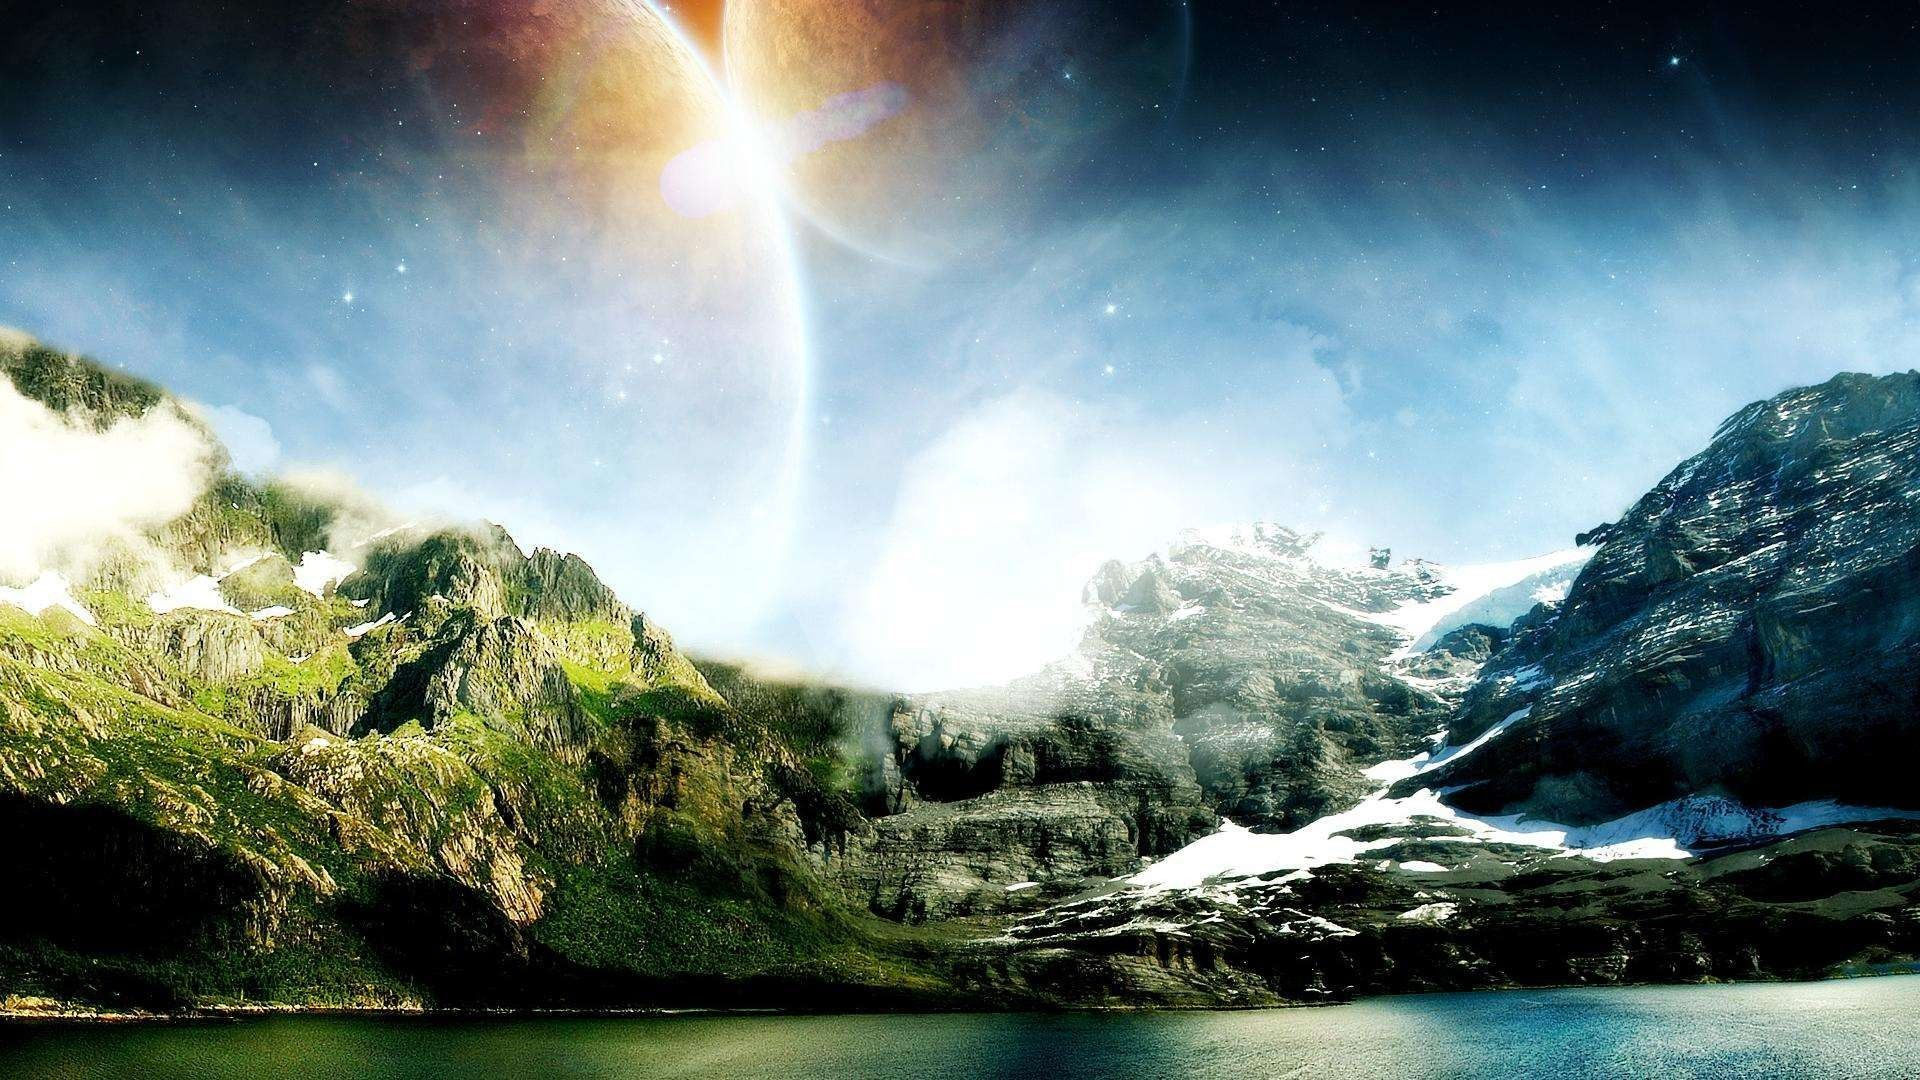 Fantasy Art Desktop Backgrounds Hd Best Wallpaper Hd Screensaver Pictures Nature Wallpaper Background Images